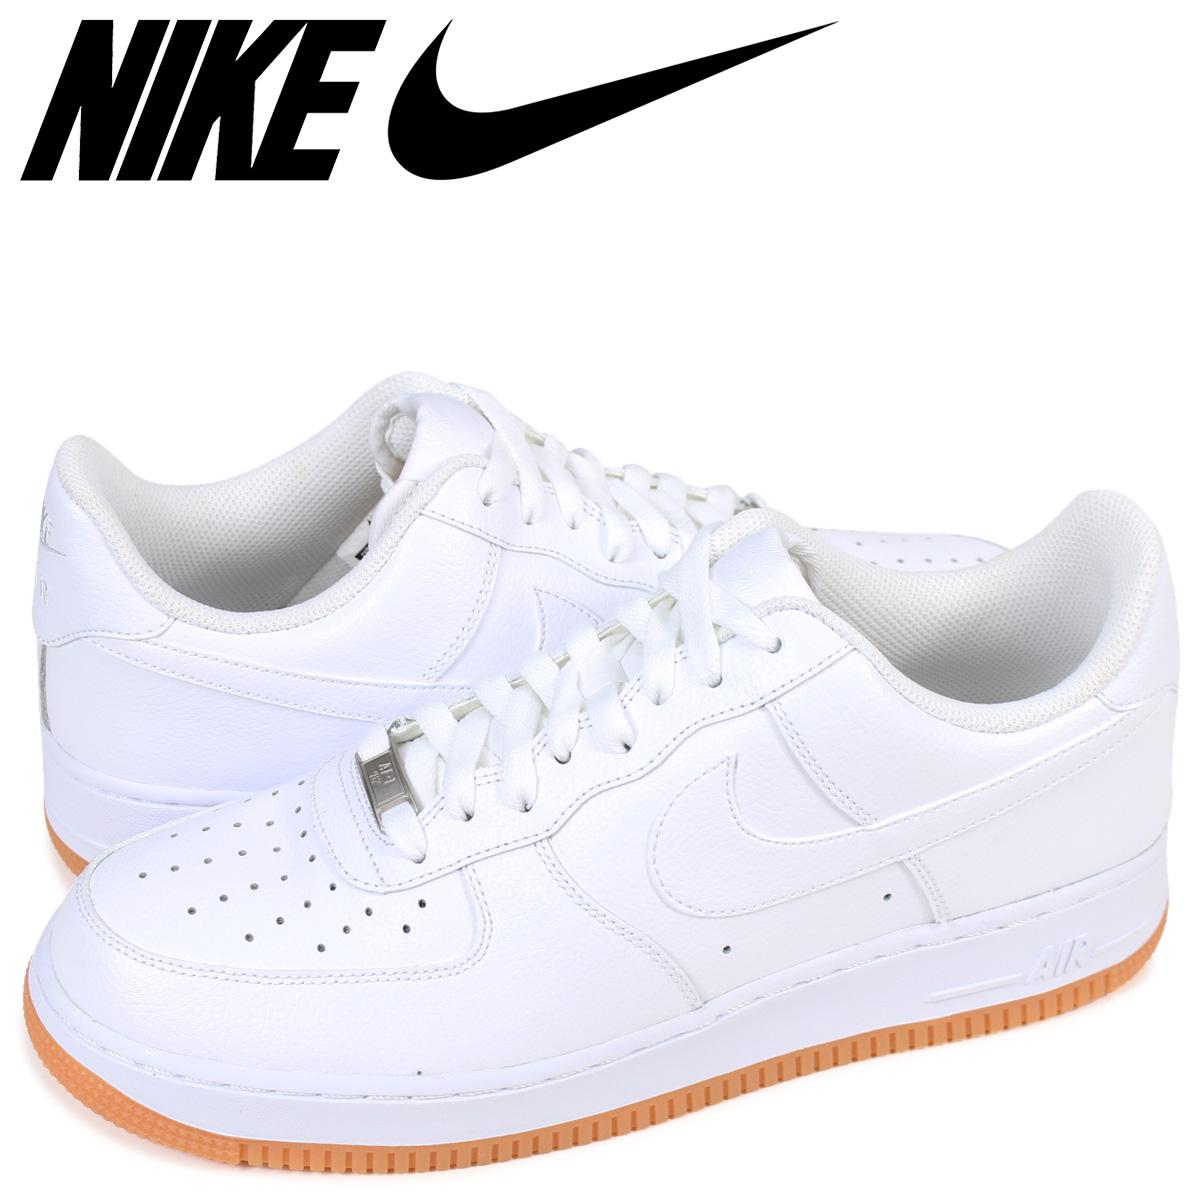 wholesale dealer fbc76 b36b1 NIKE Nike air force 1 07 sneakers men AIR FORCE 1 LOW white white  488,298-129